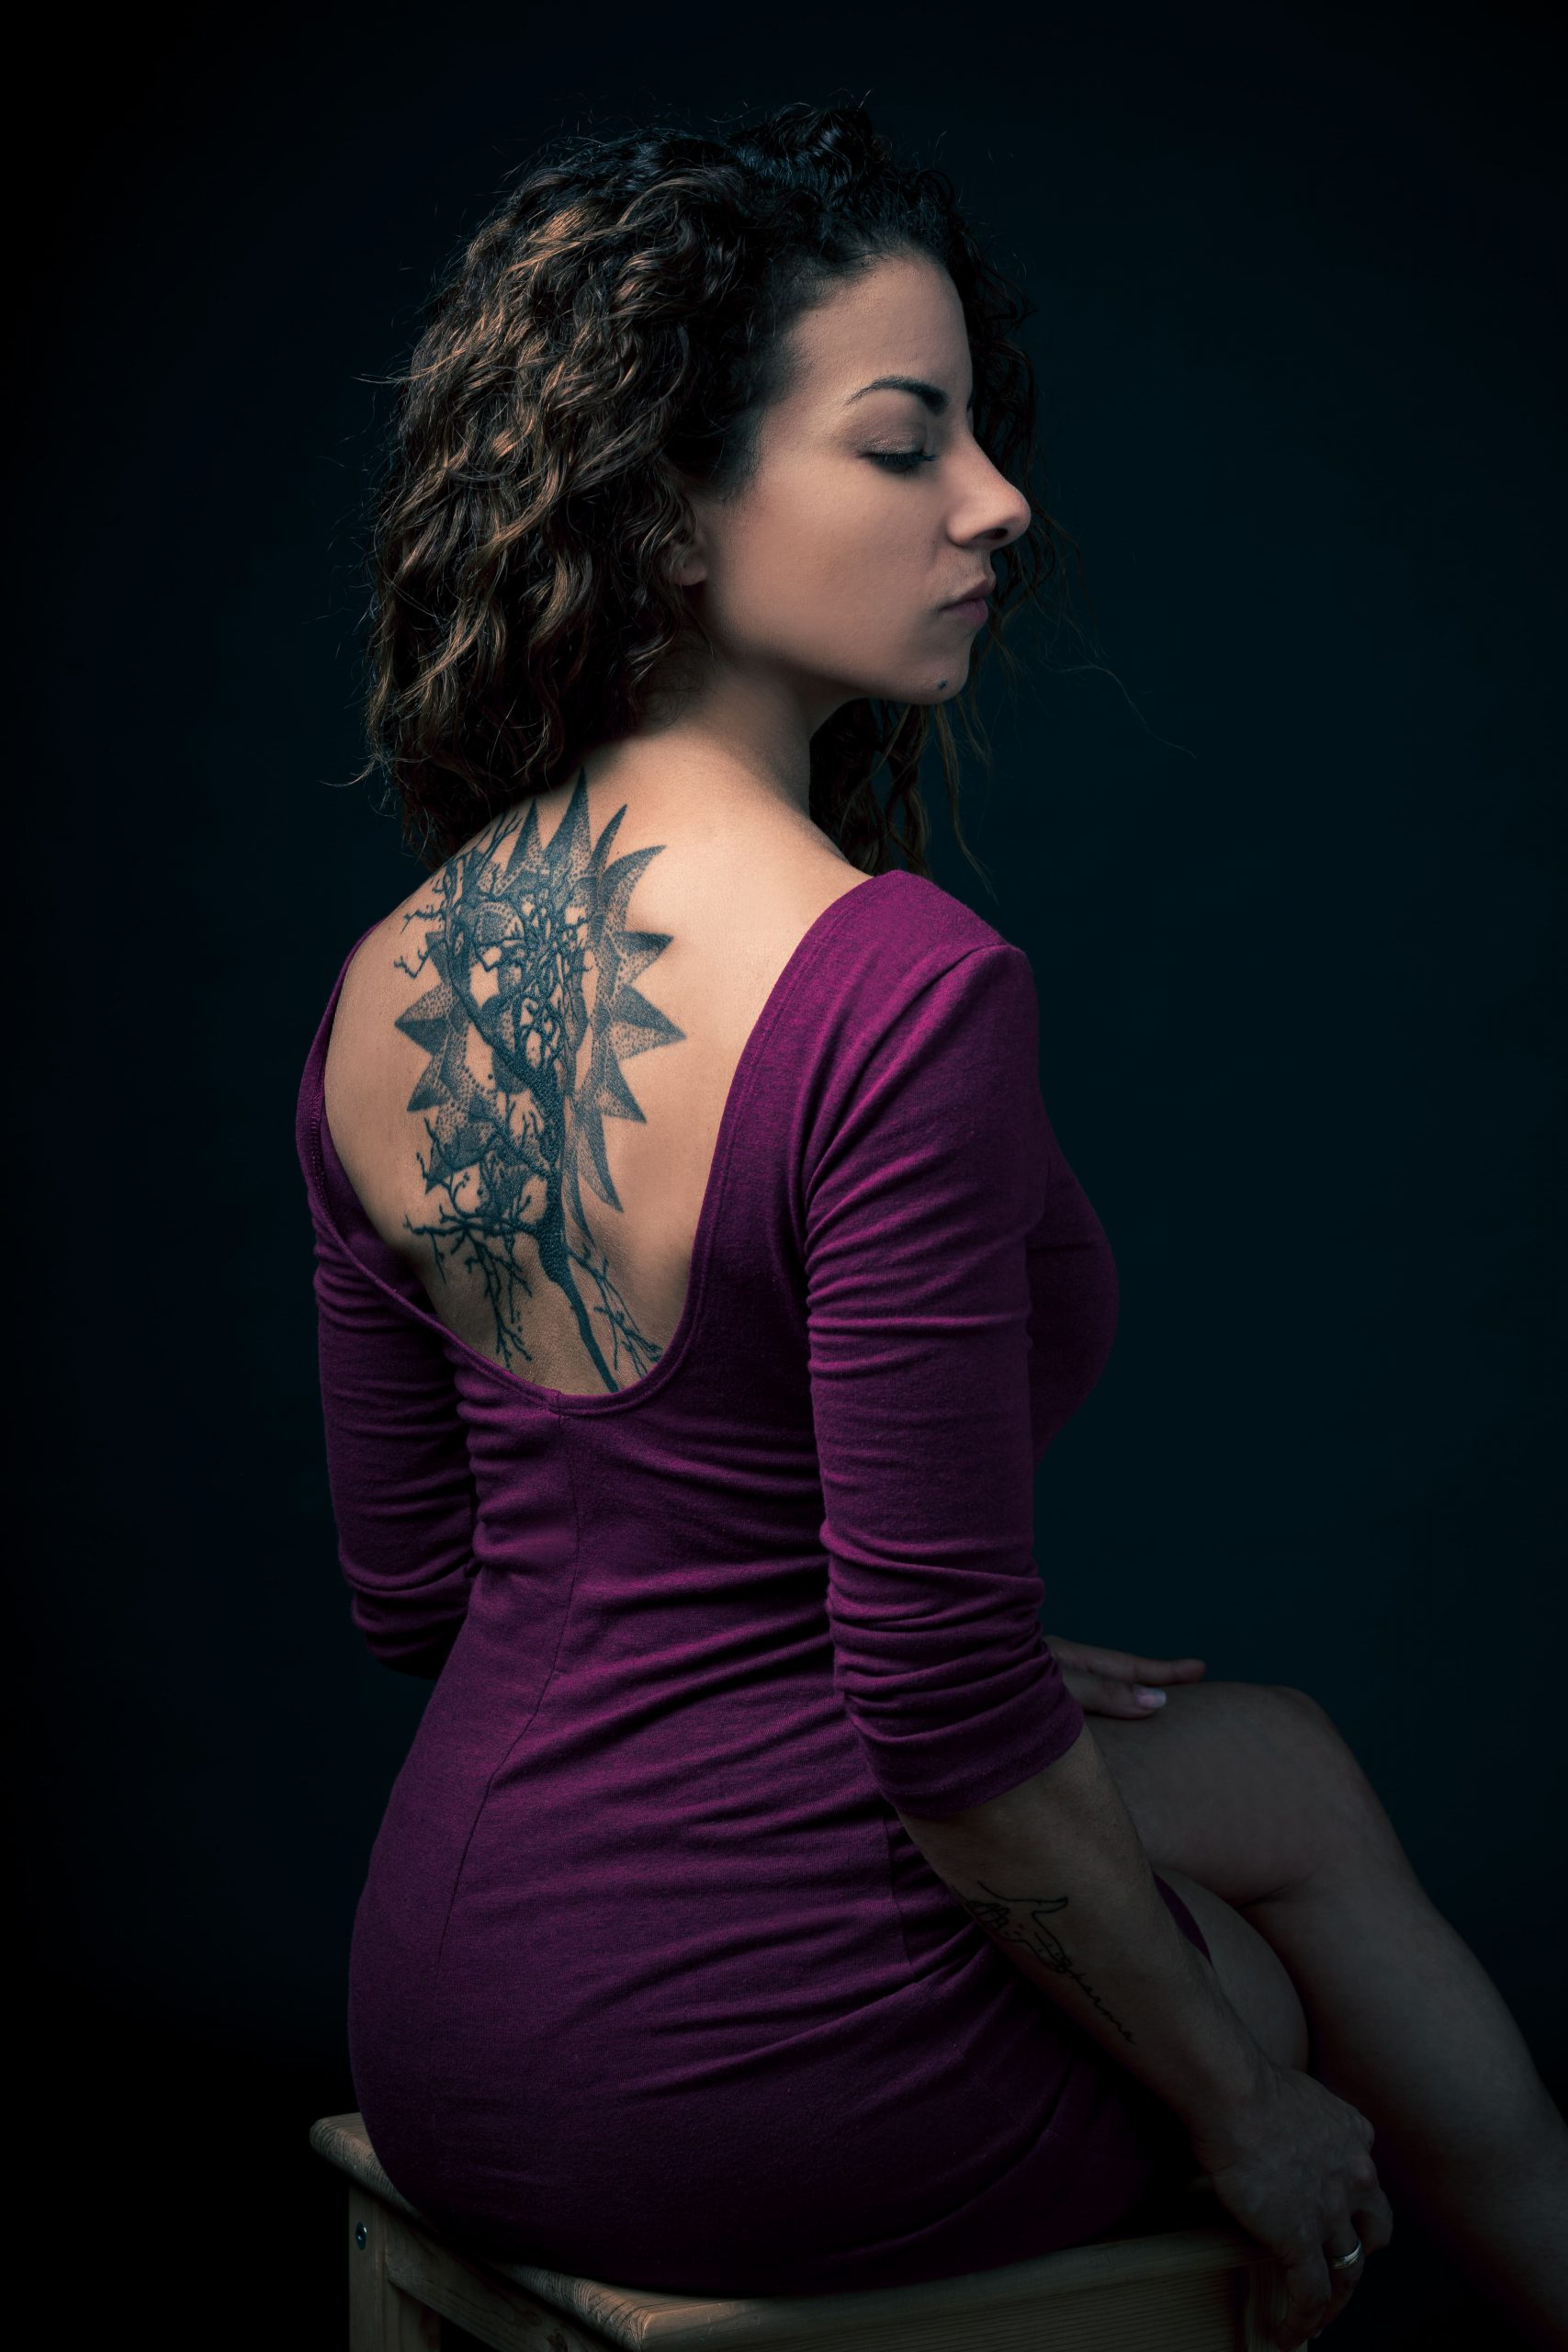 Lifestylephotodesign Melanieschmidt Beautyportrait Salwa 065